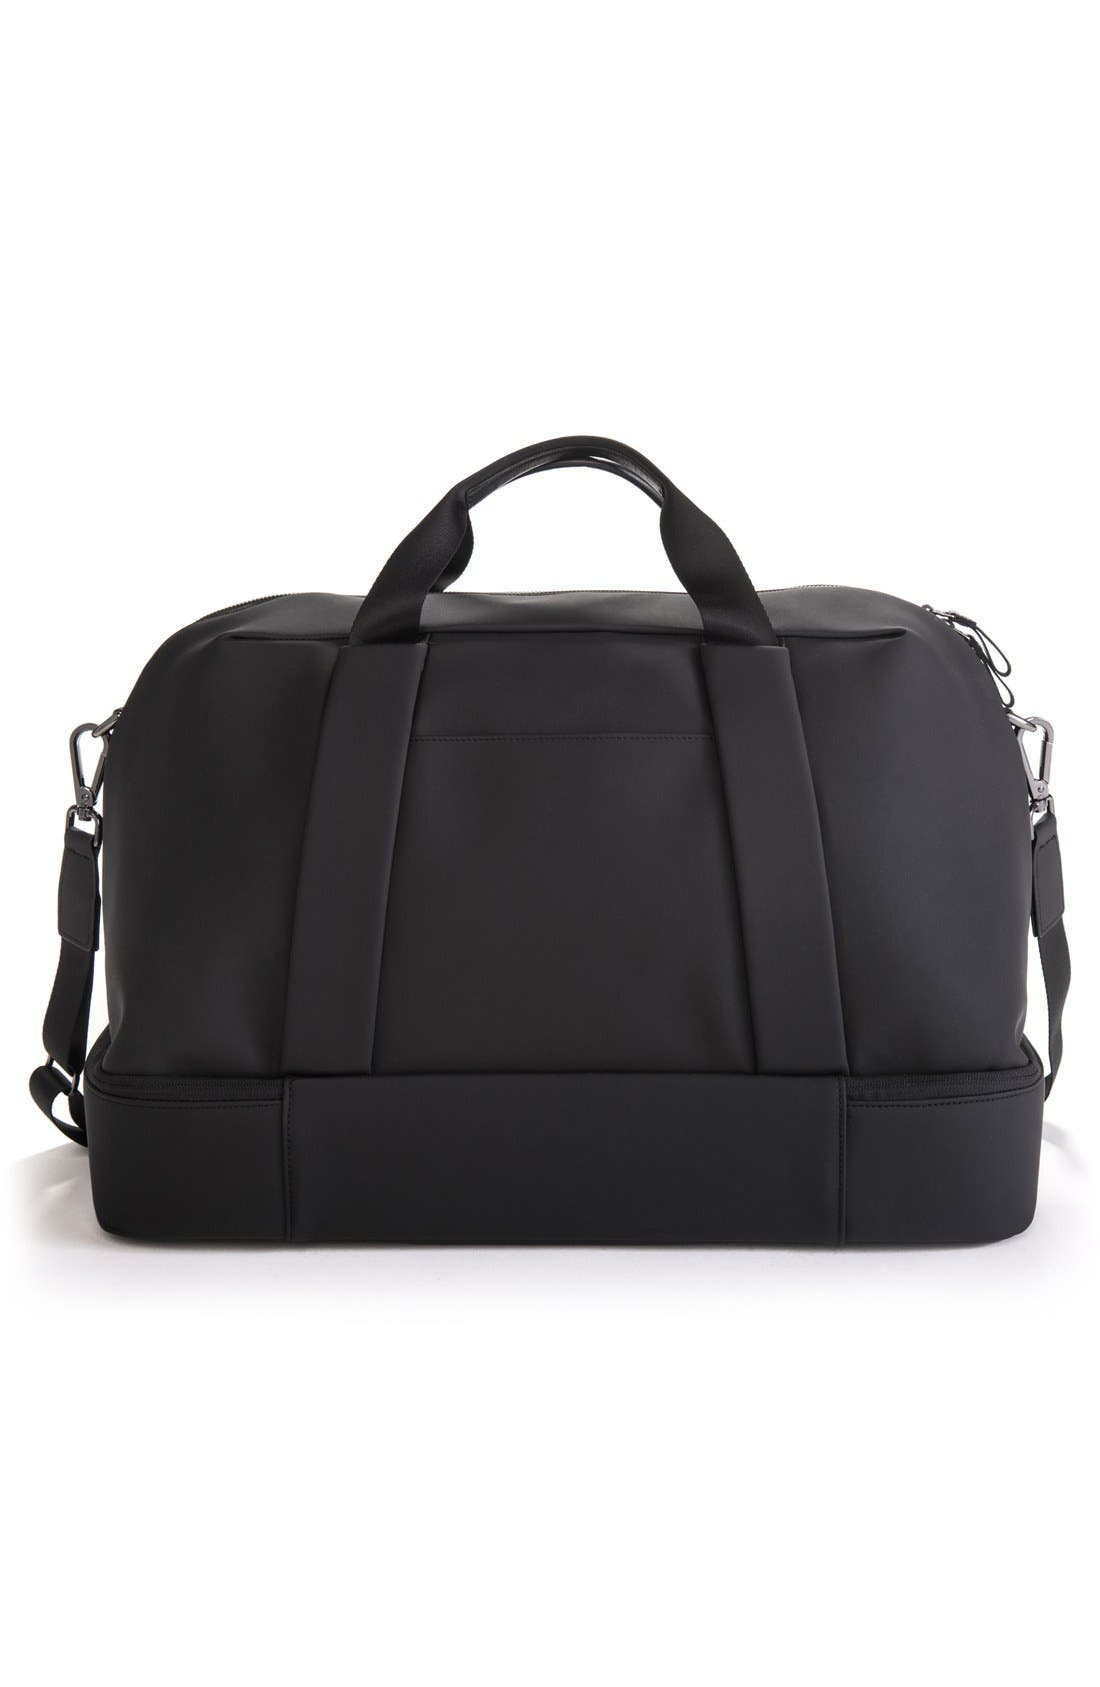 Signature Large Boston Duffel Bag,                             Alternate thumbnail 5, color,                             MATTE BLACK